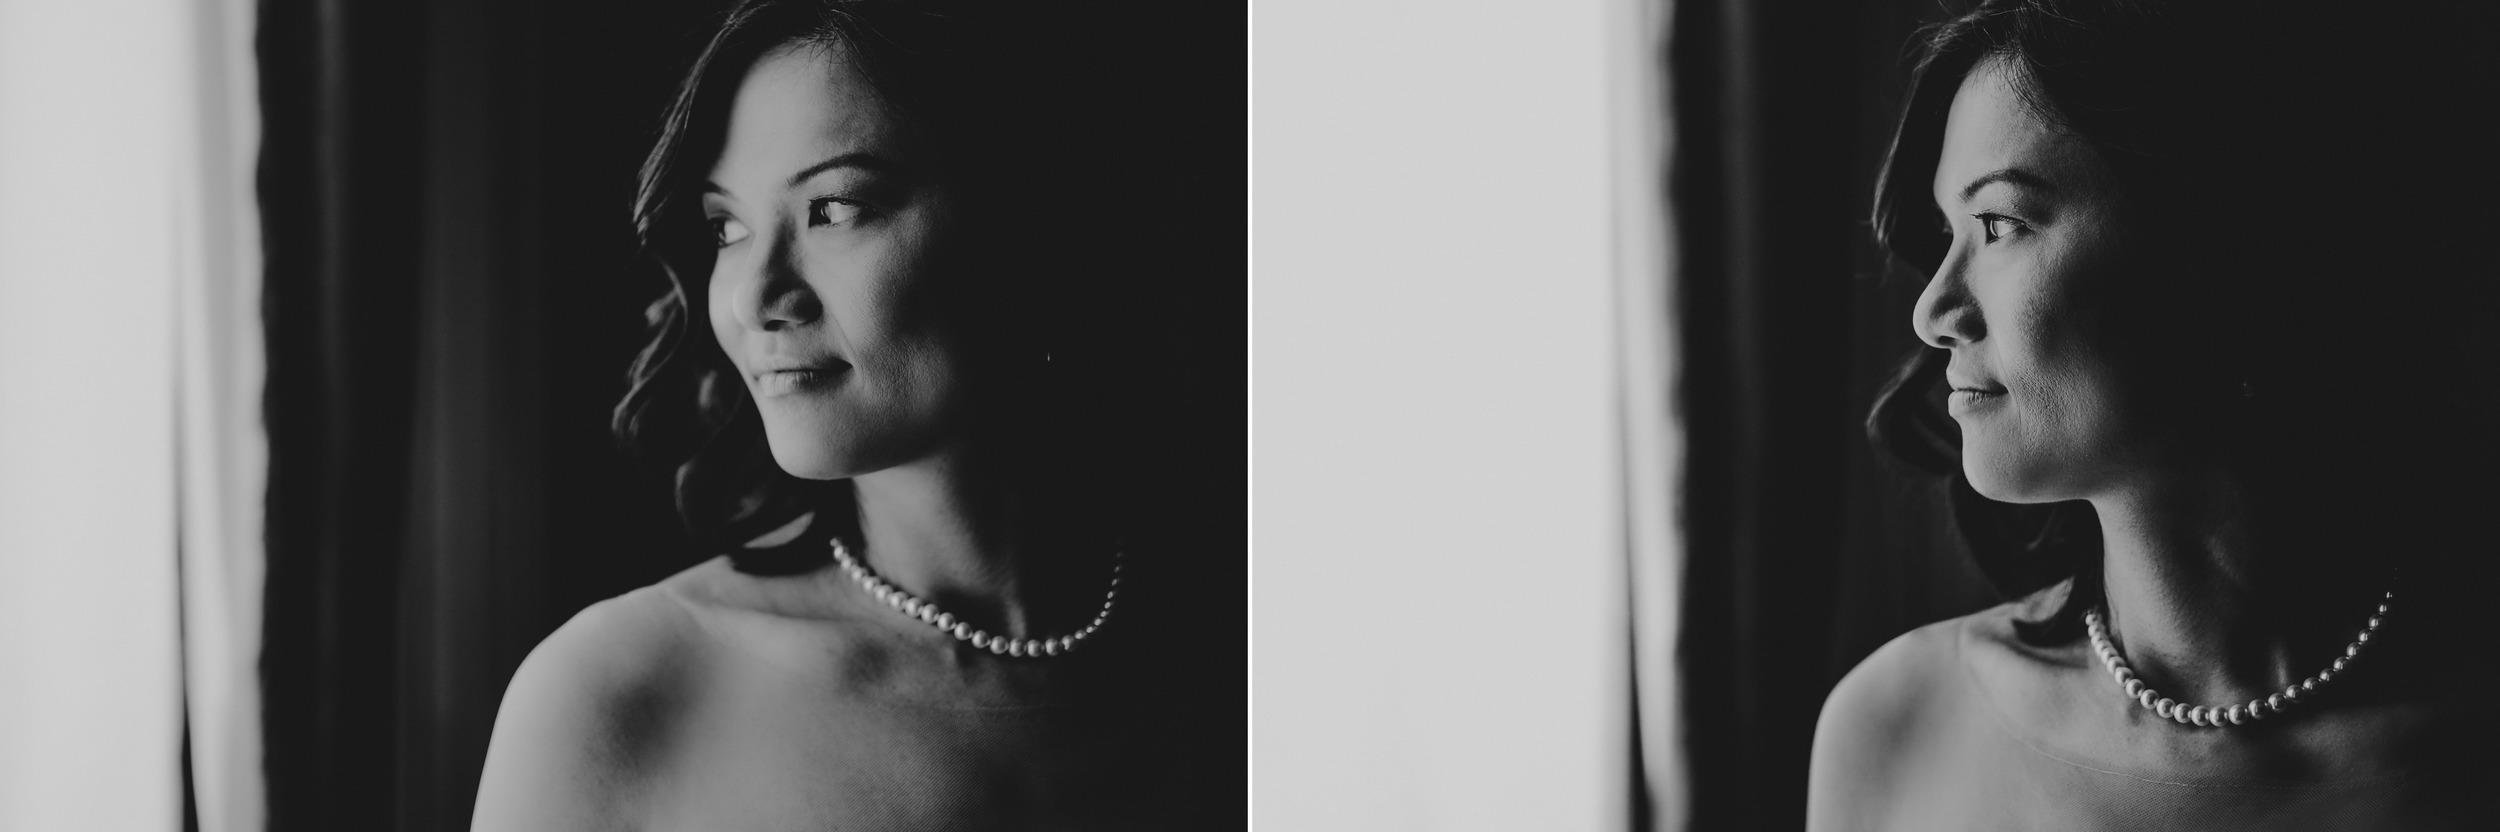 bruidsfotografie amsterdam het grachtenhuis portret